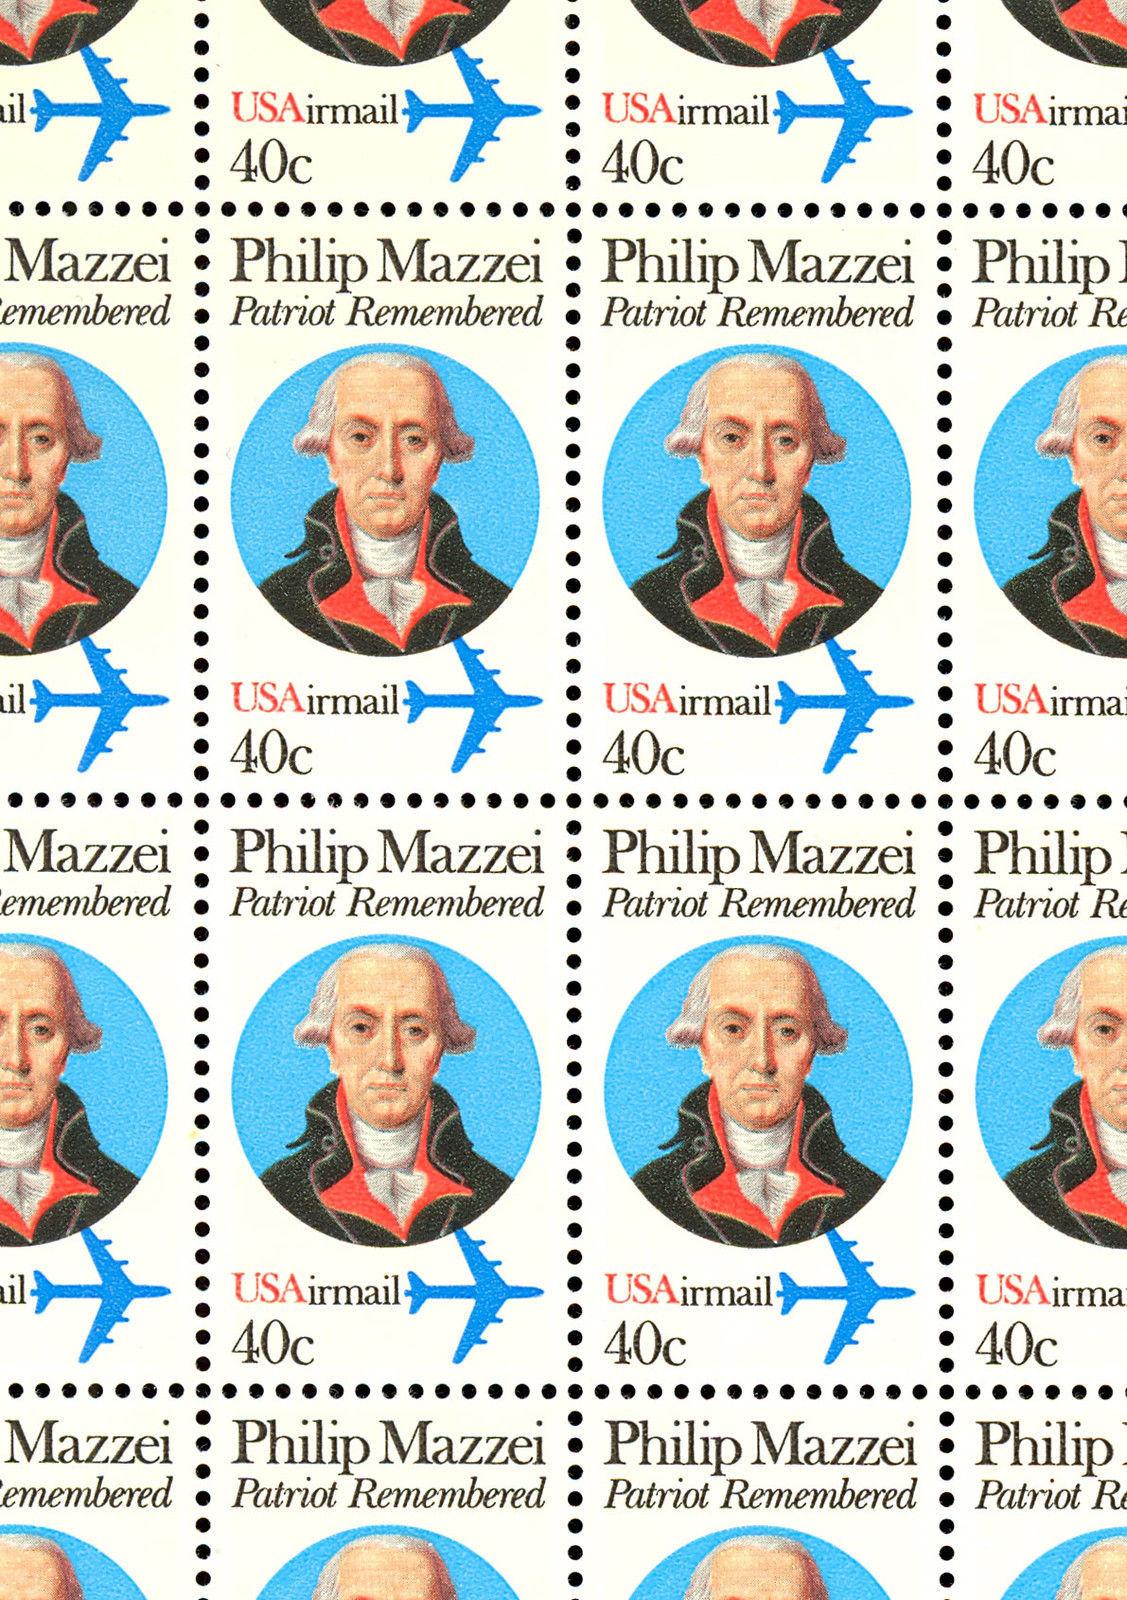 C98 Complete Sheet of 50 Philip Mazzei 40 Cent Airmail Stamps - Stuart Katz